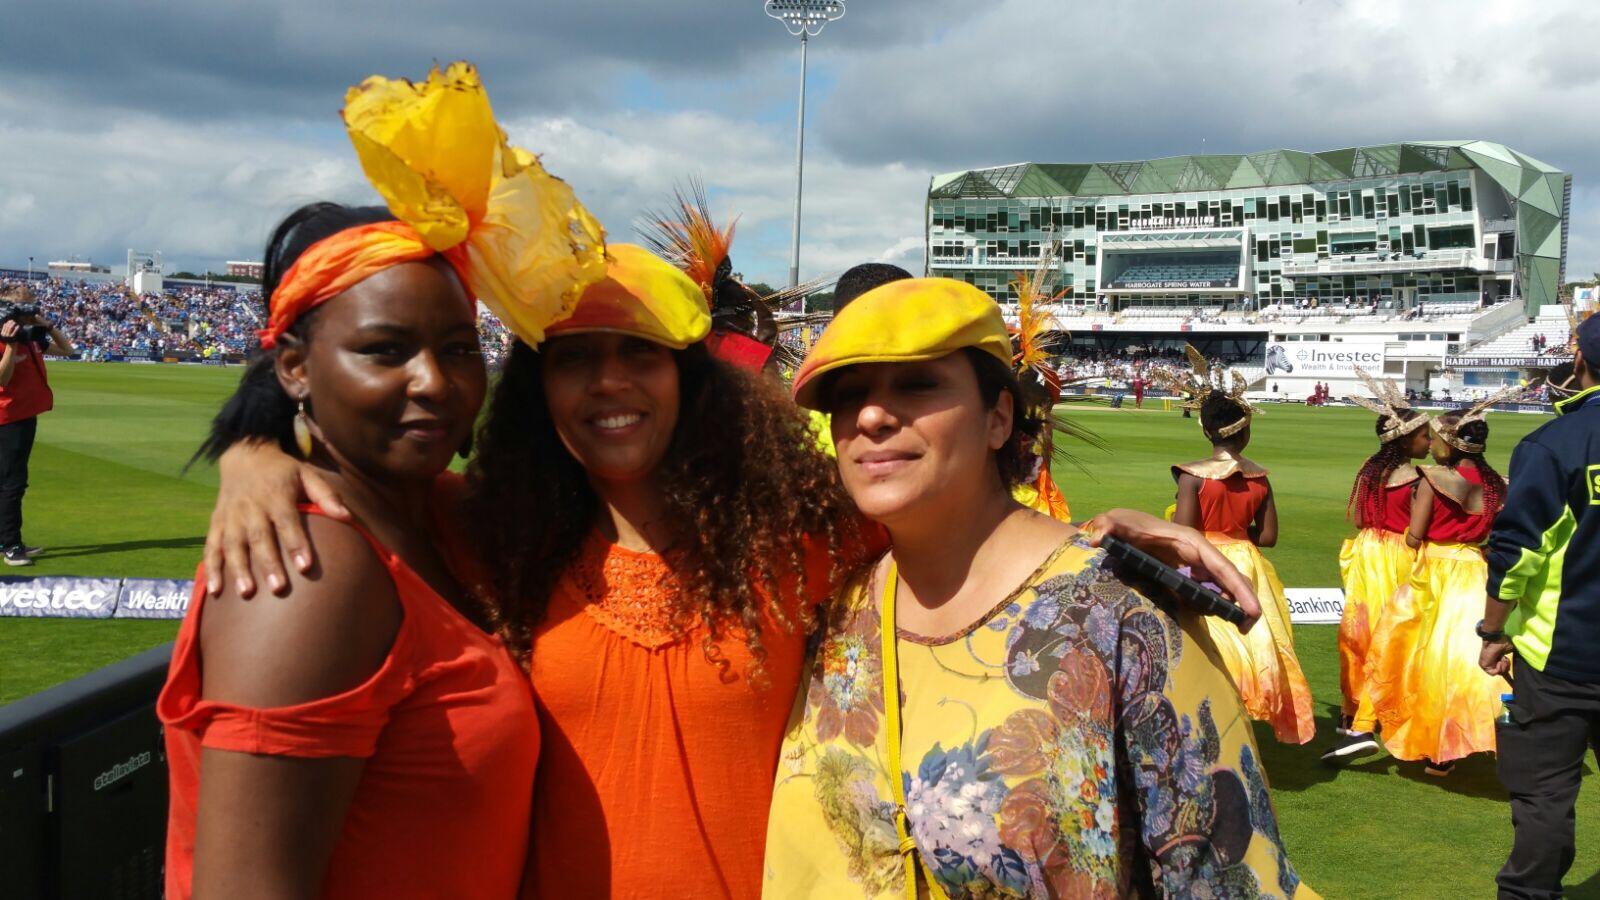 Artists Tracey Pinder, Rhian Kempadoo-Millar and Shamce Hassan at Headingley Cricket Ground.